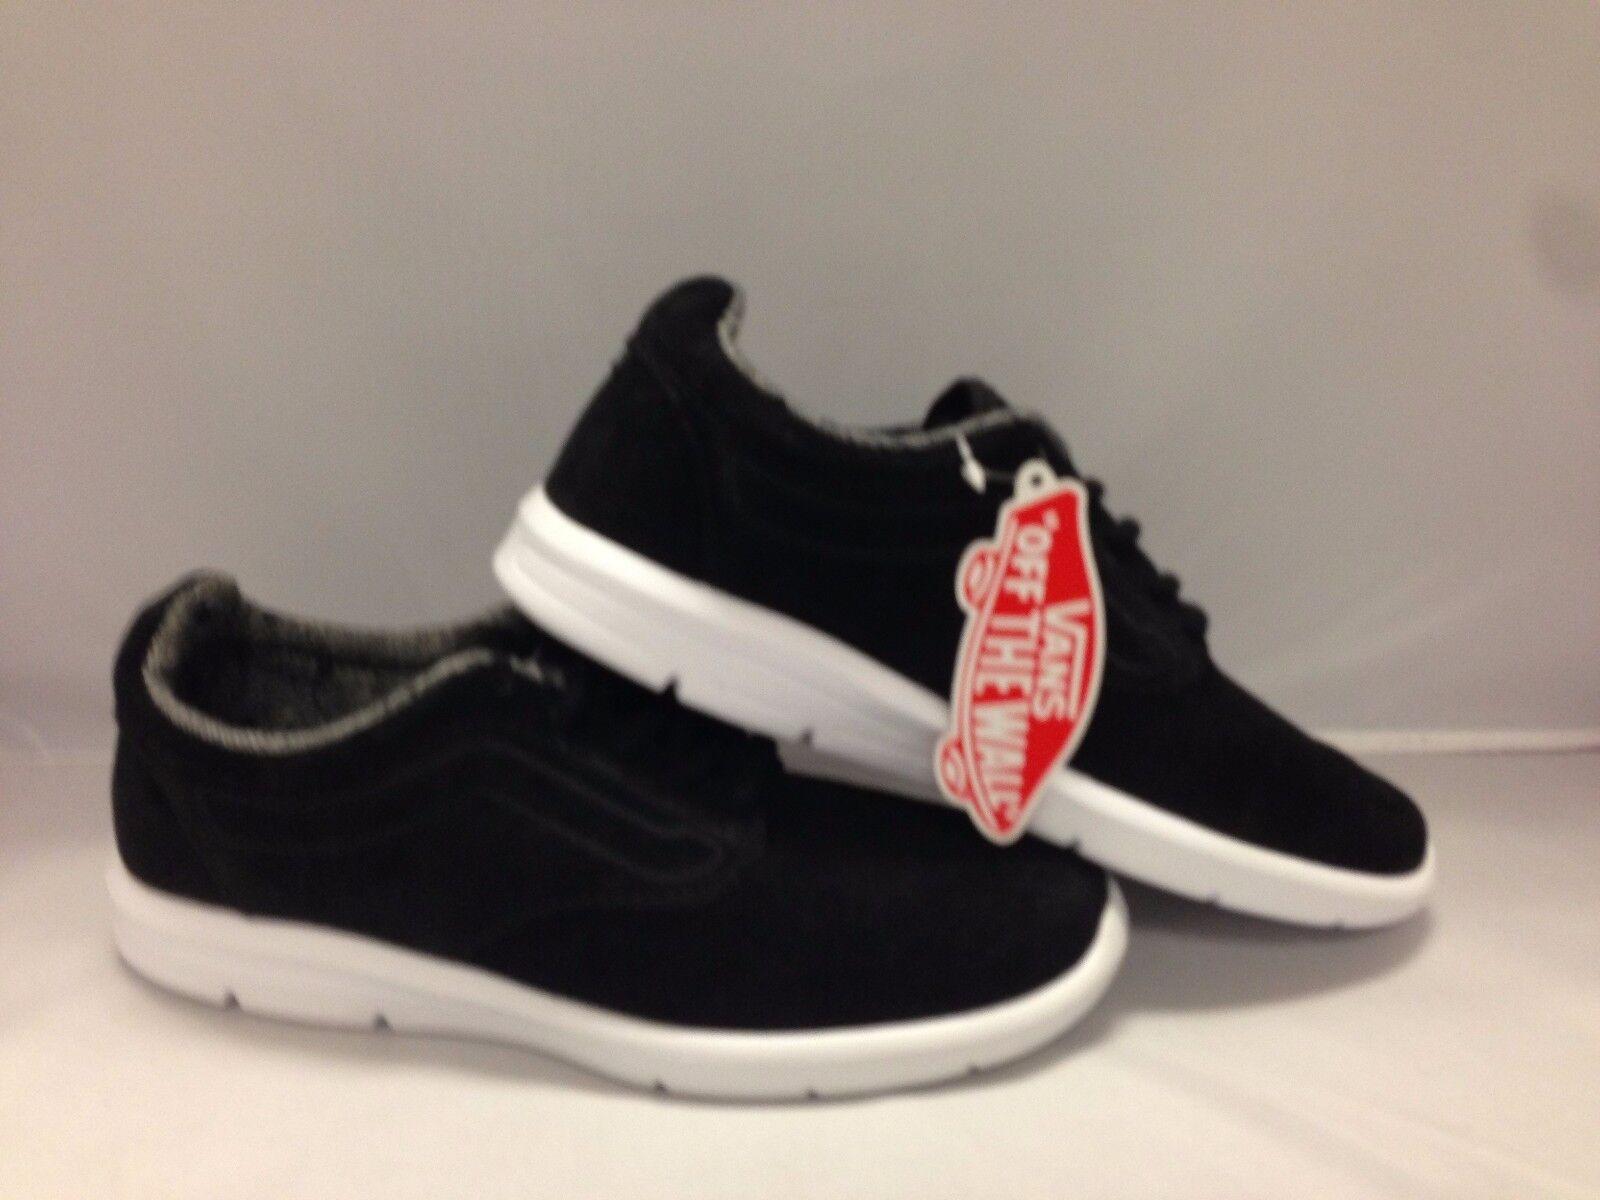 Vans Men's shoes  ISO 1.5   (Tweed Dots) Black White